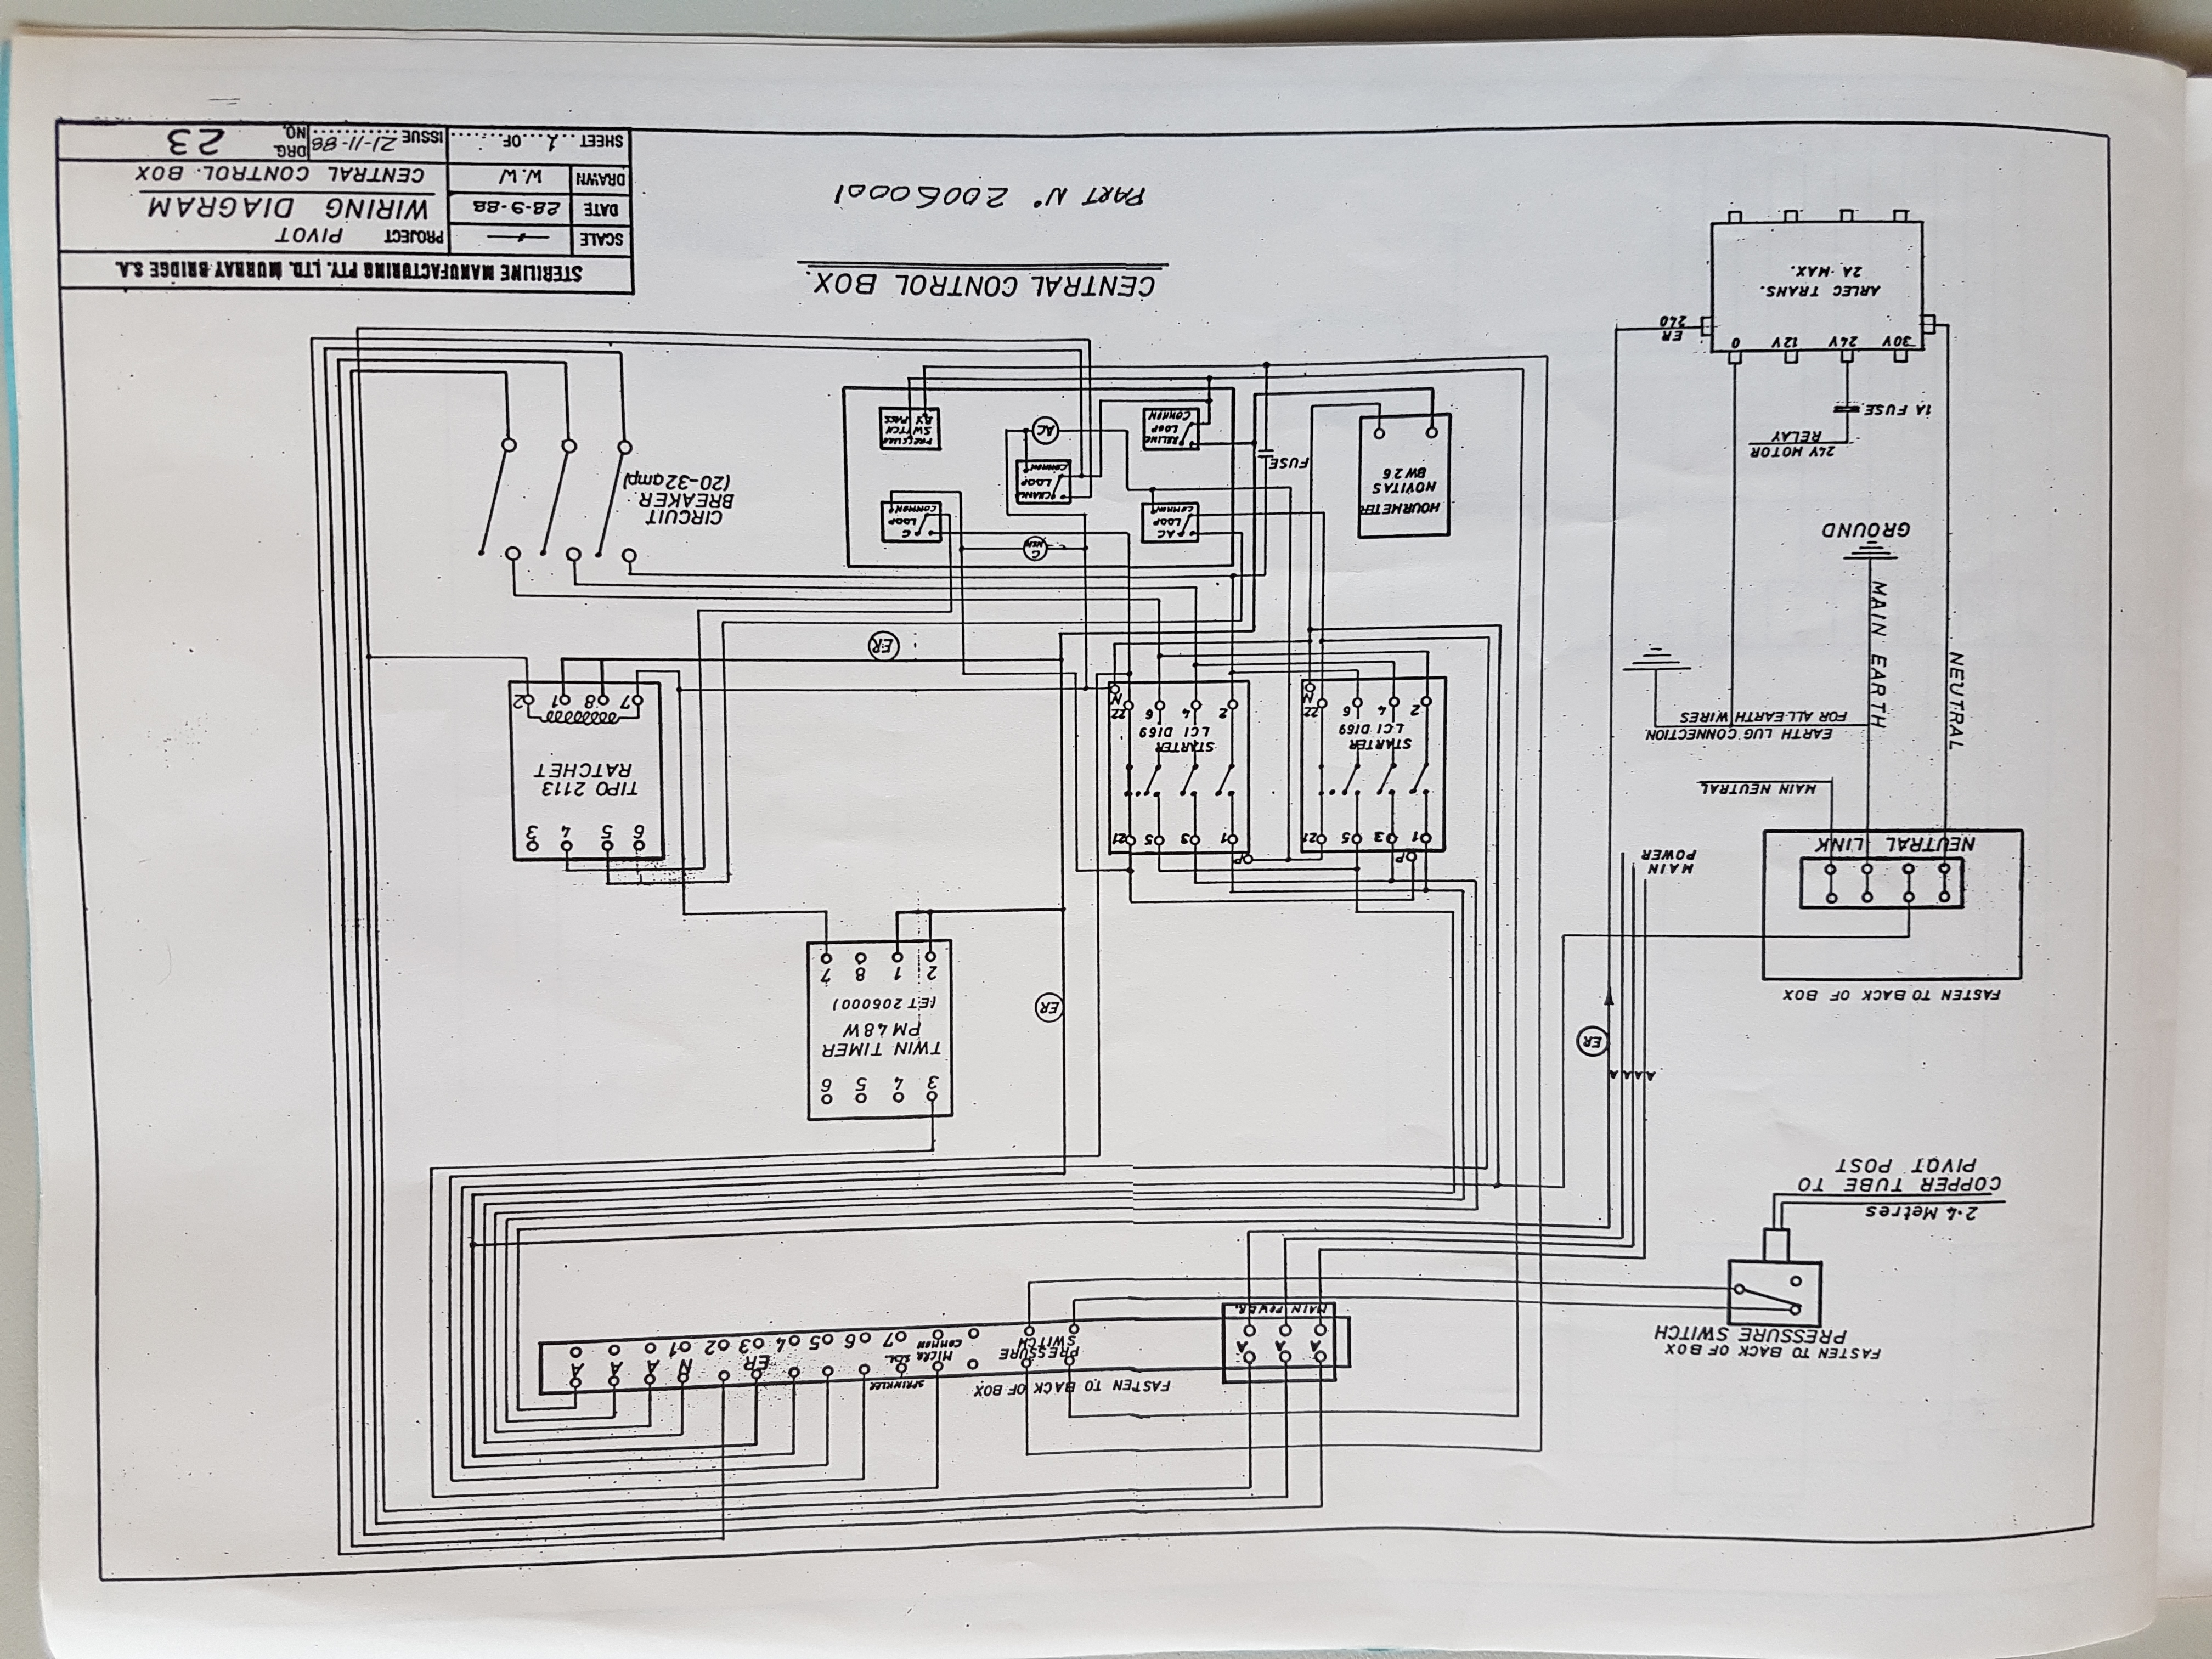 Zimmatic Wiring Diagram Archive Of Automotive Baja 90cc Rectifier Index Downloads Rh Benparts Com Au Irrigation Pivot